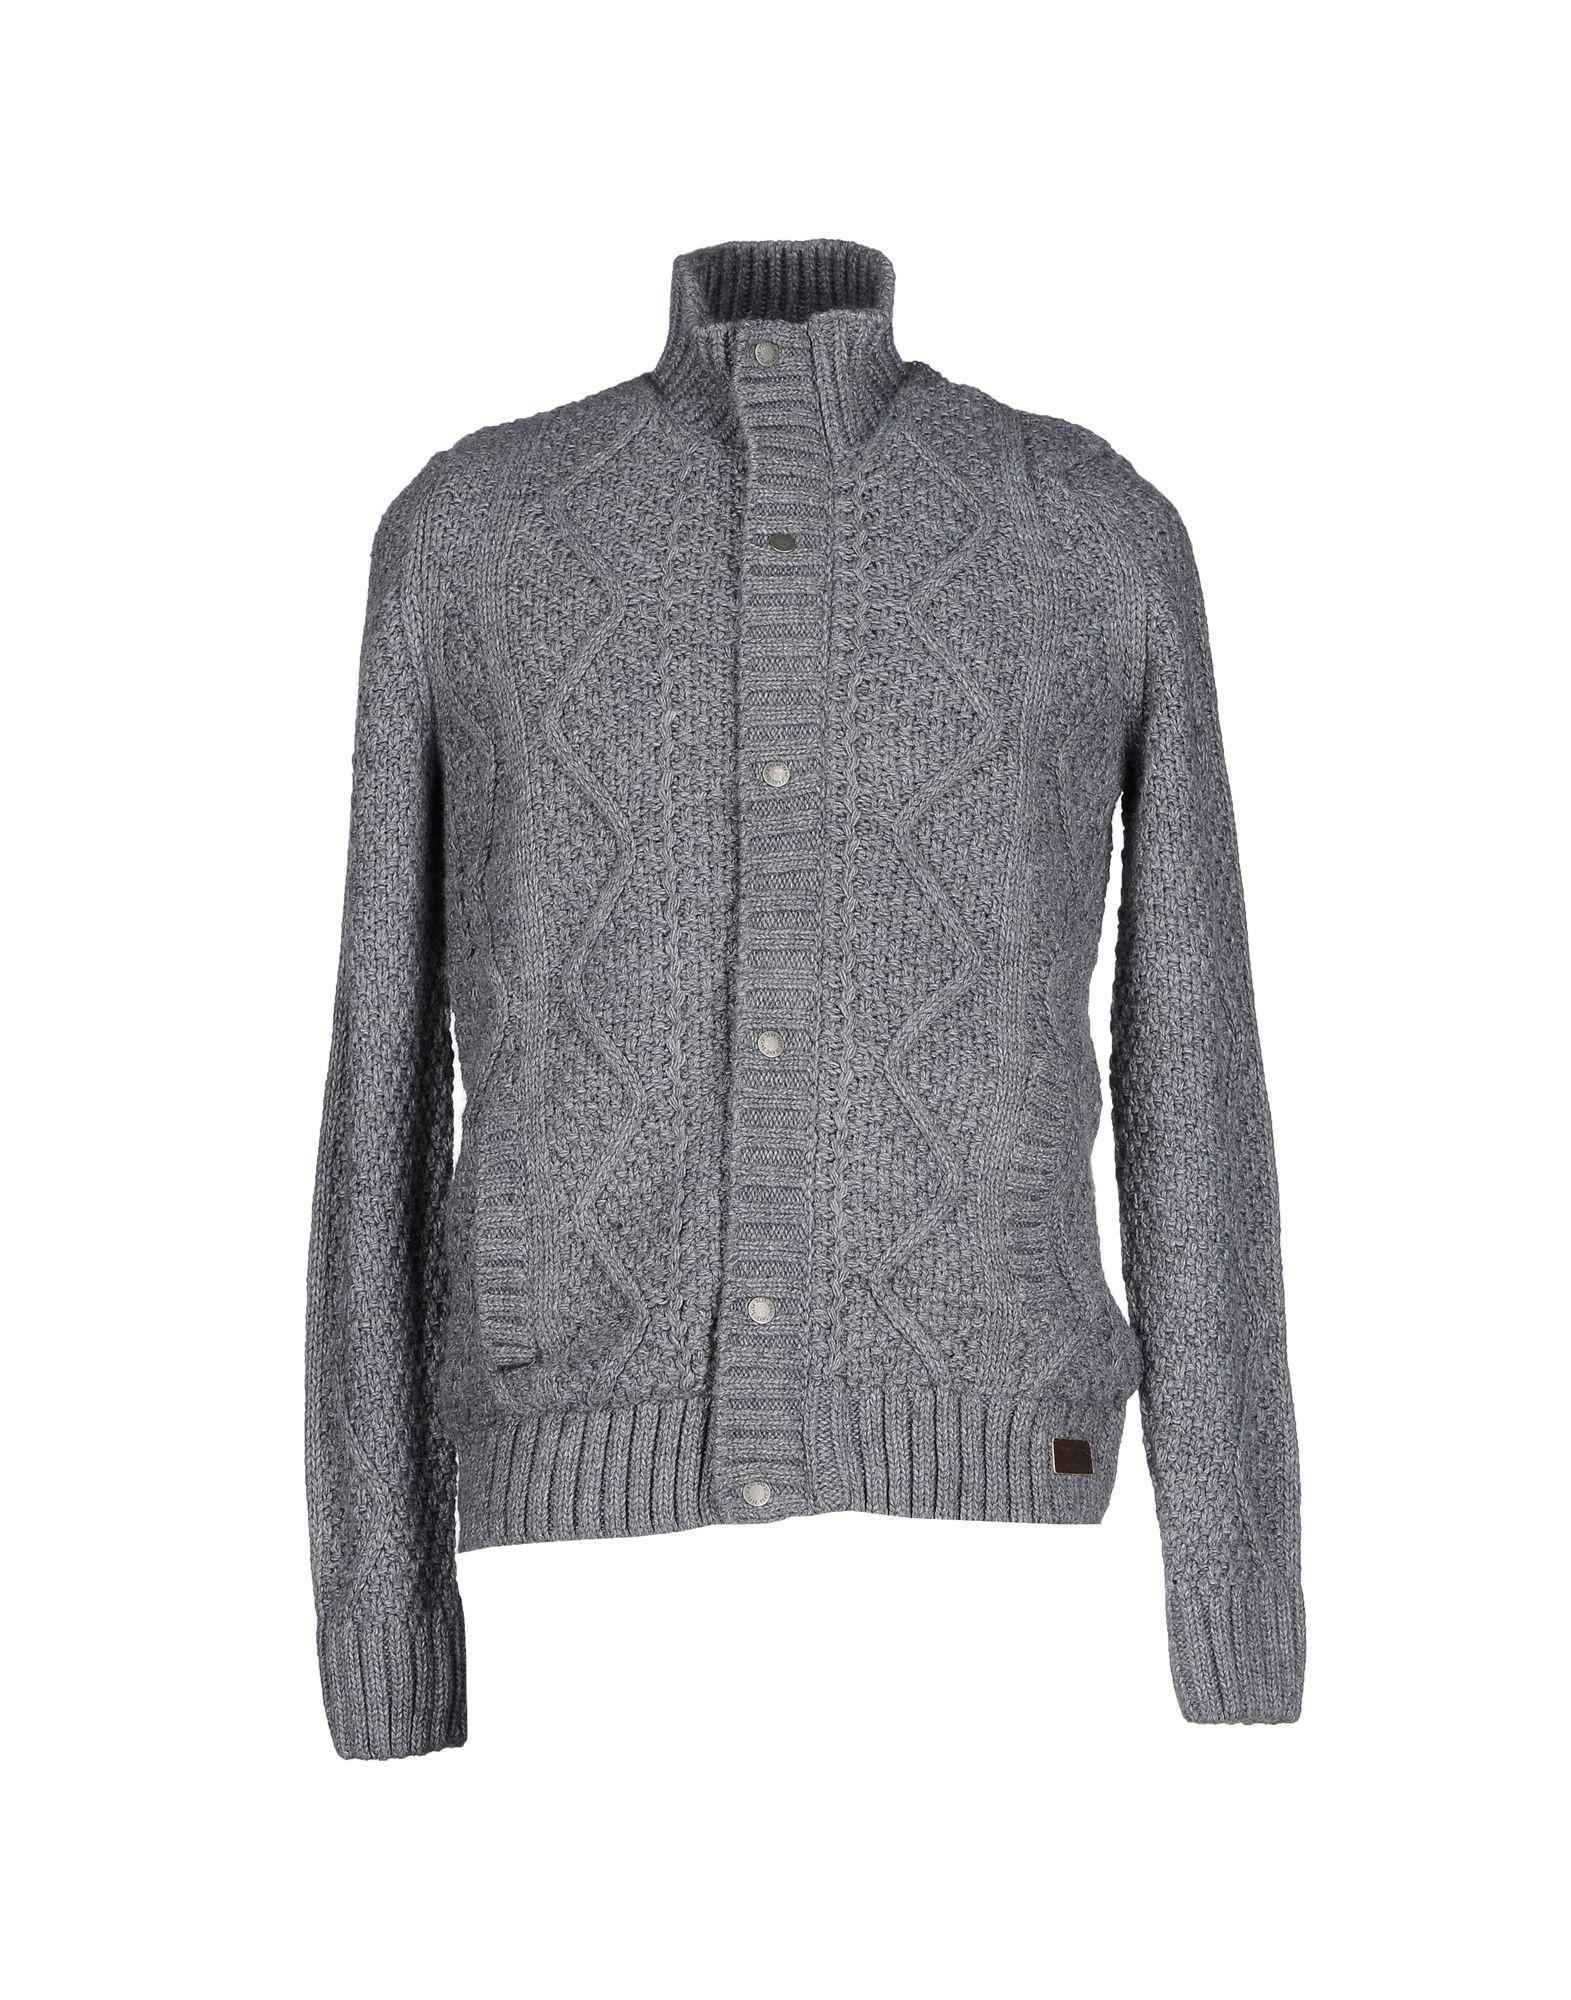 pepe jeans jacket in gray for men lyst. Black Bedroom Furniture Sets. Home Design Ideas